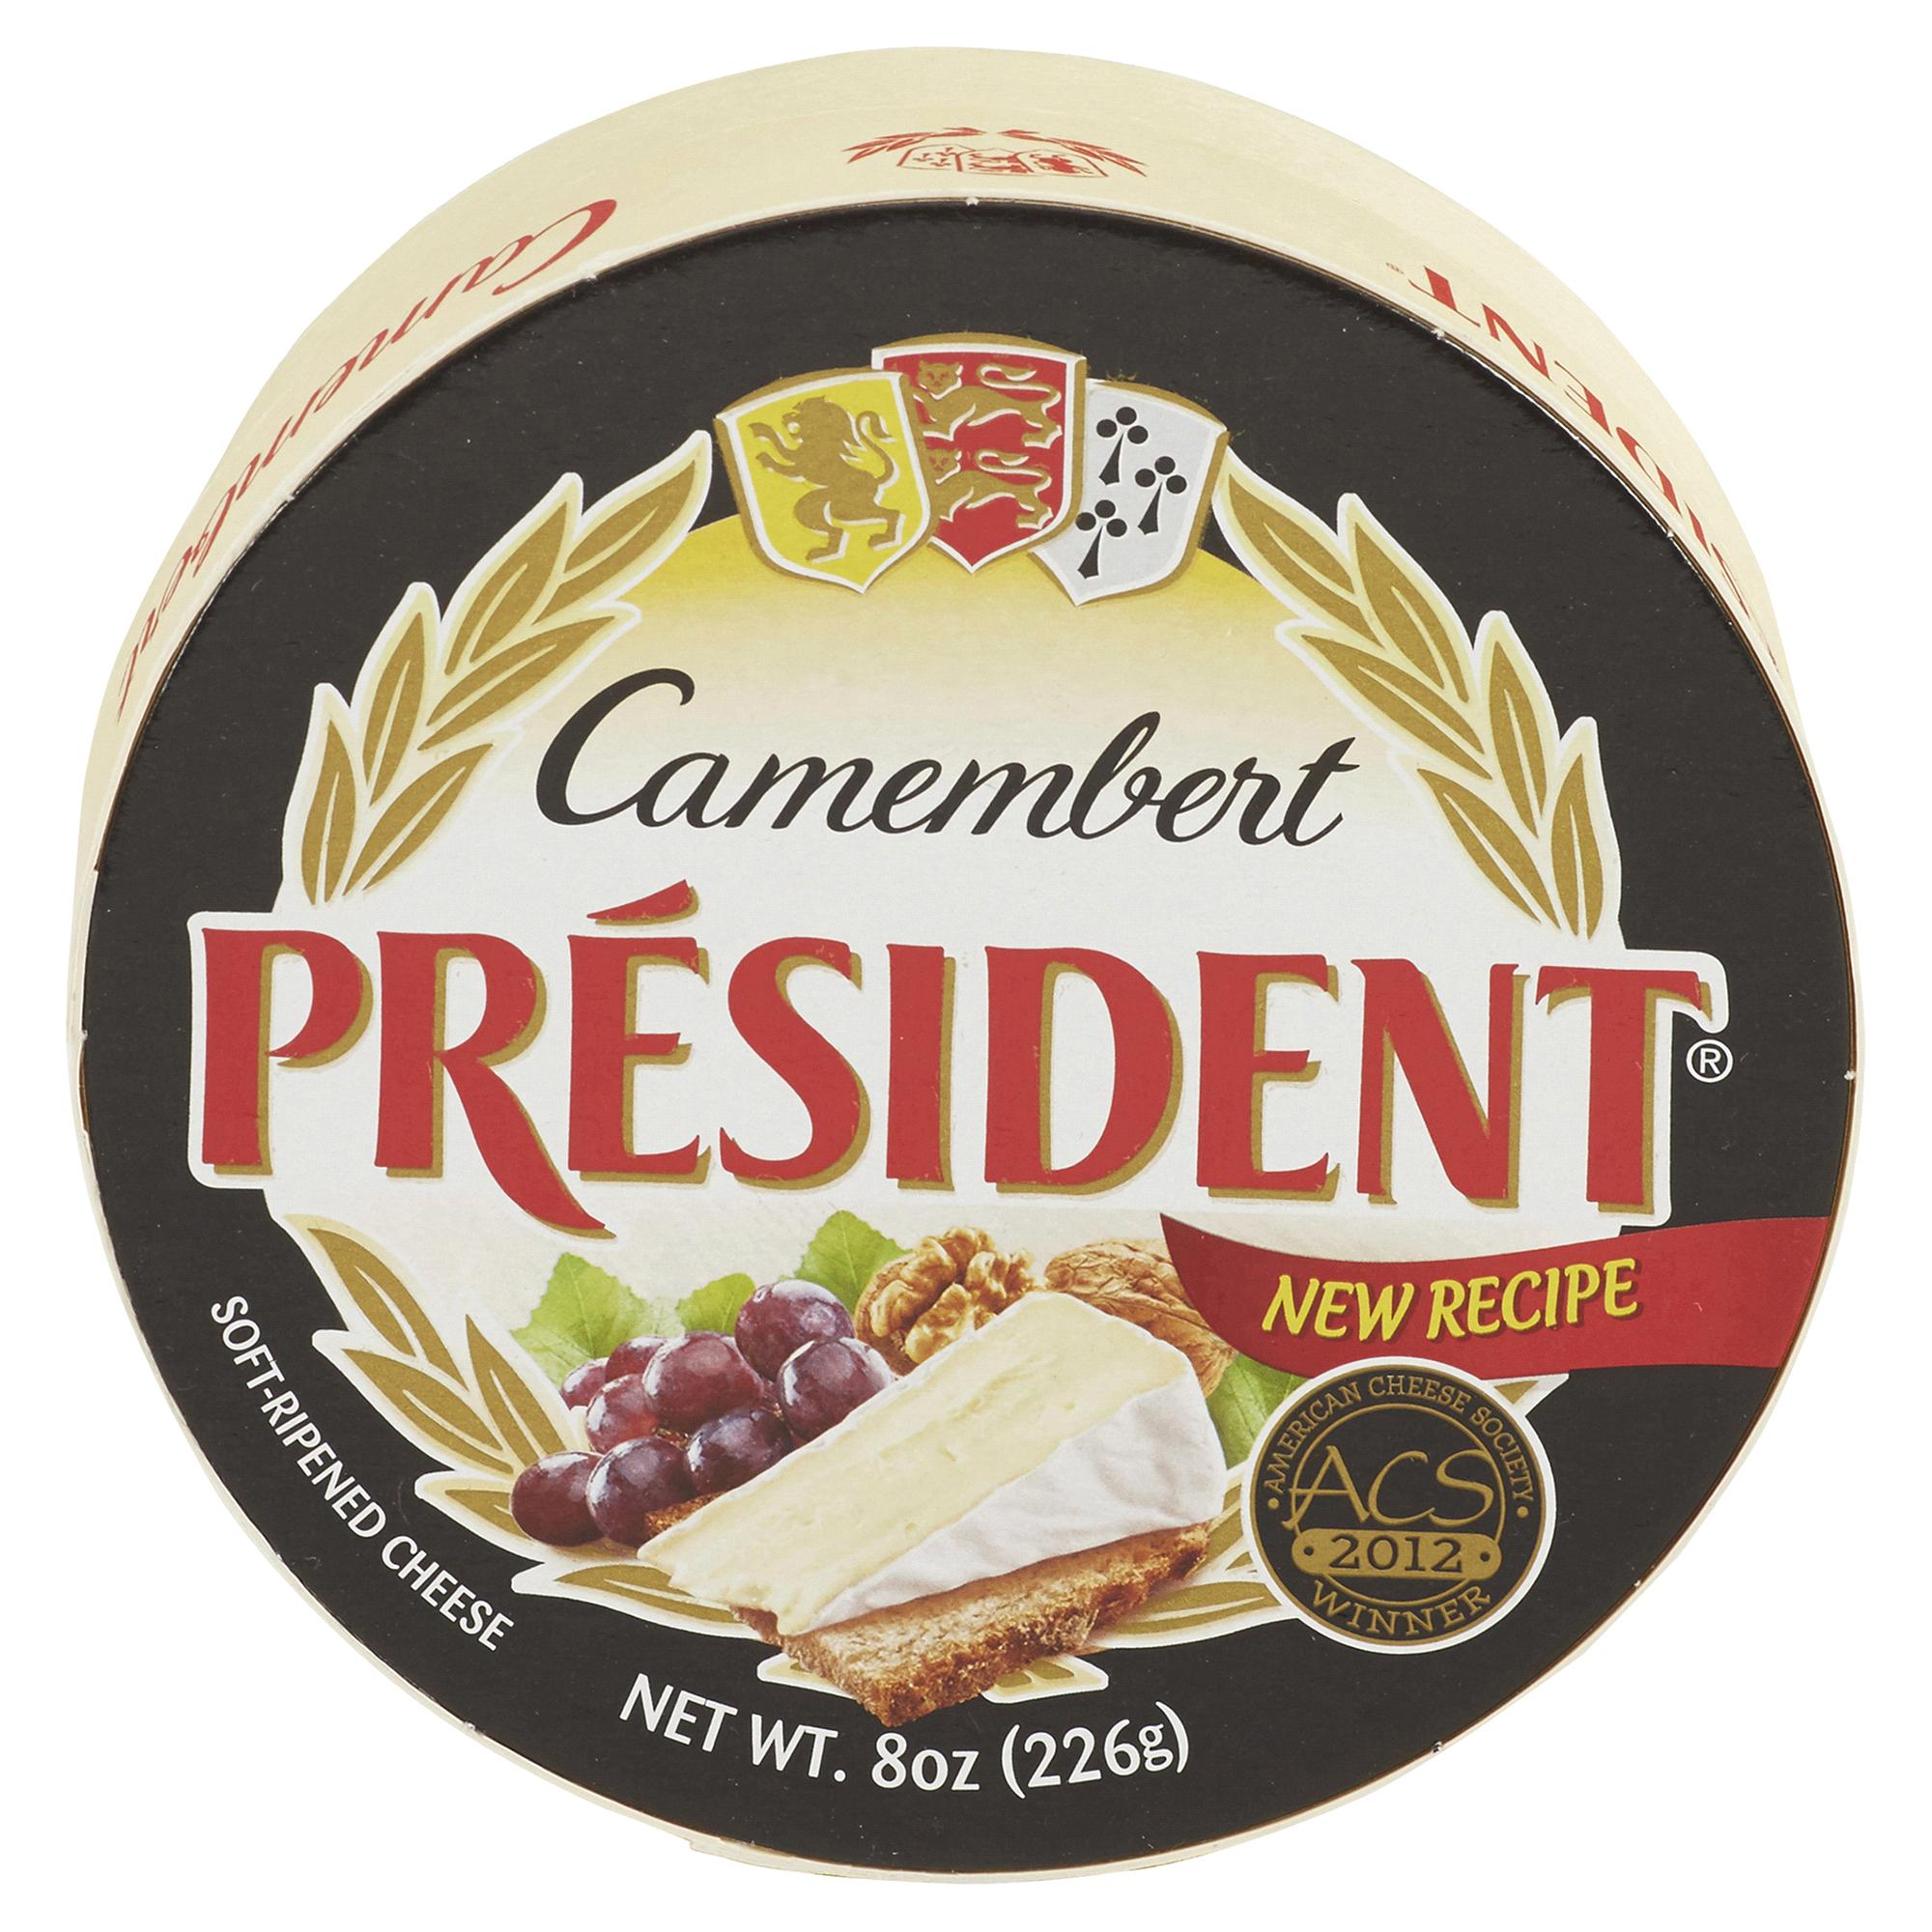 President Camembert Cheese 8 oz | Meijer.com